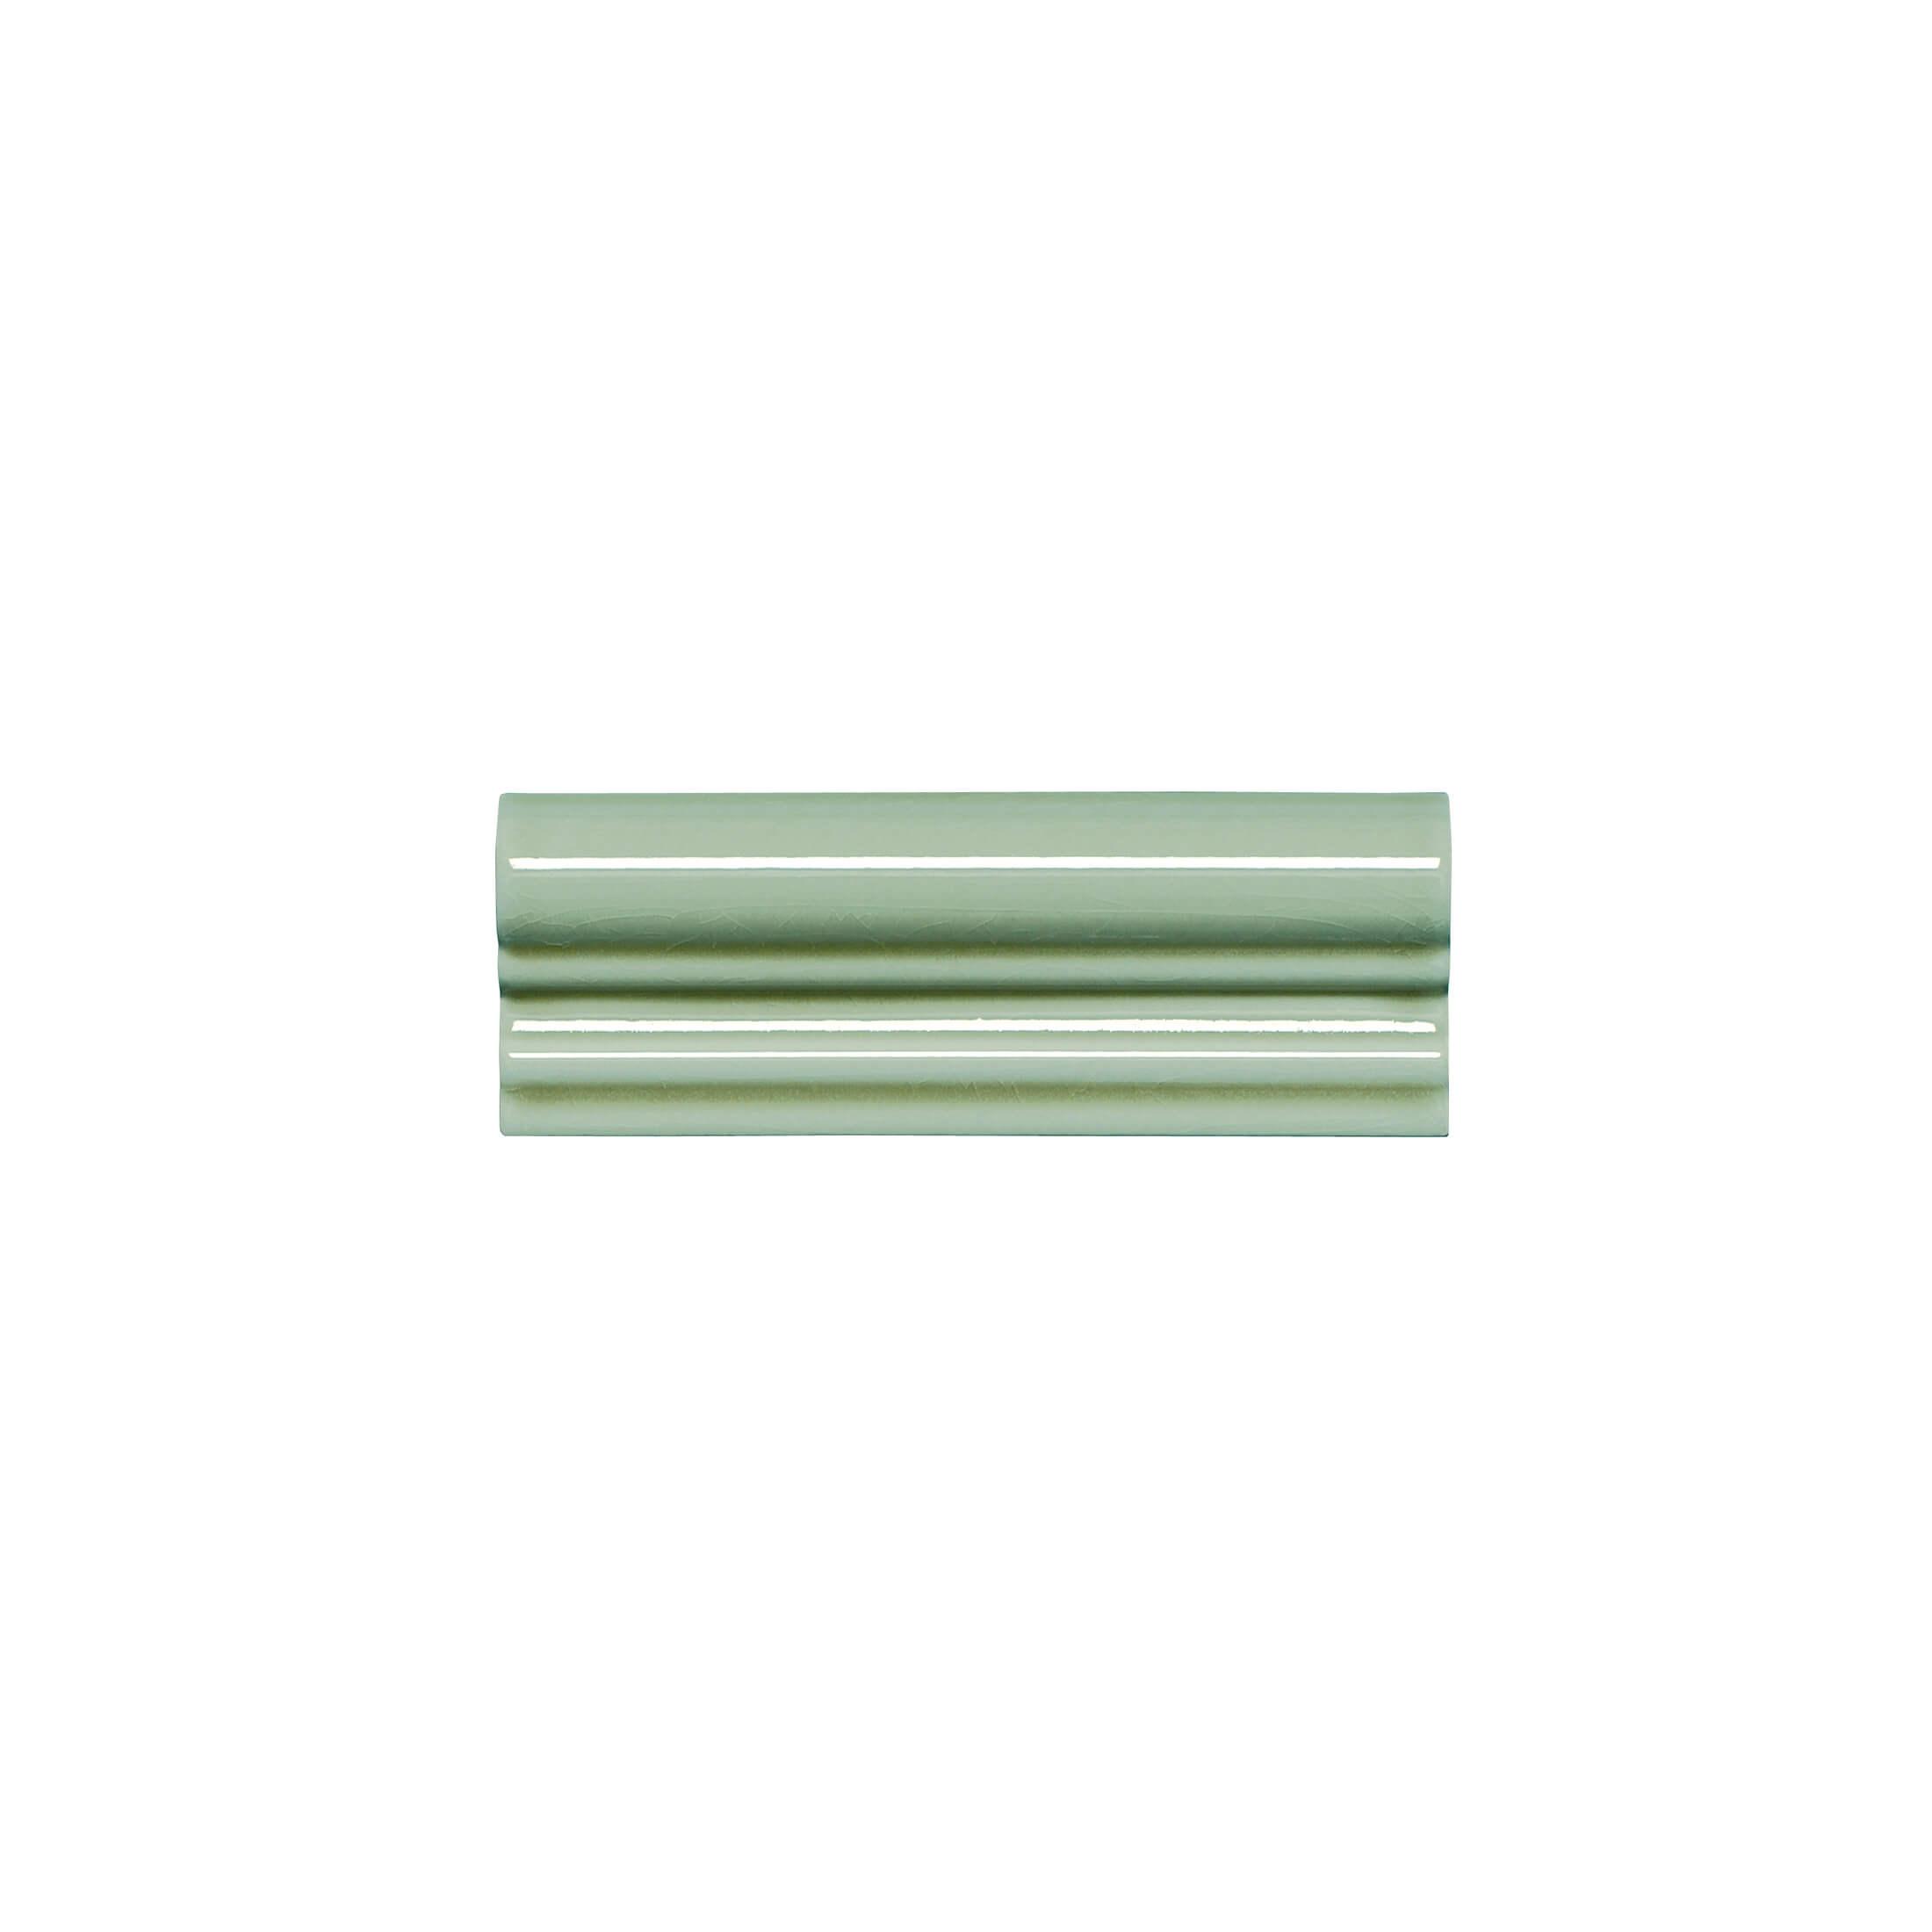 ADMO5169 - MOLDURA ITALIANA PB C/C - 5 cm X 15 cm